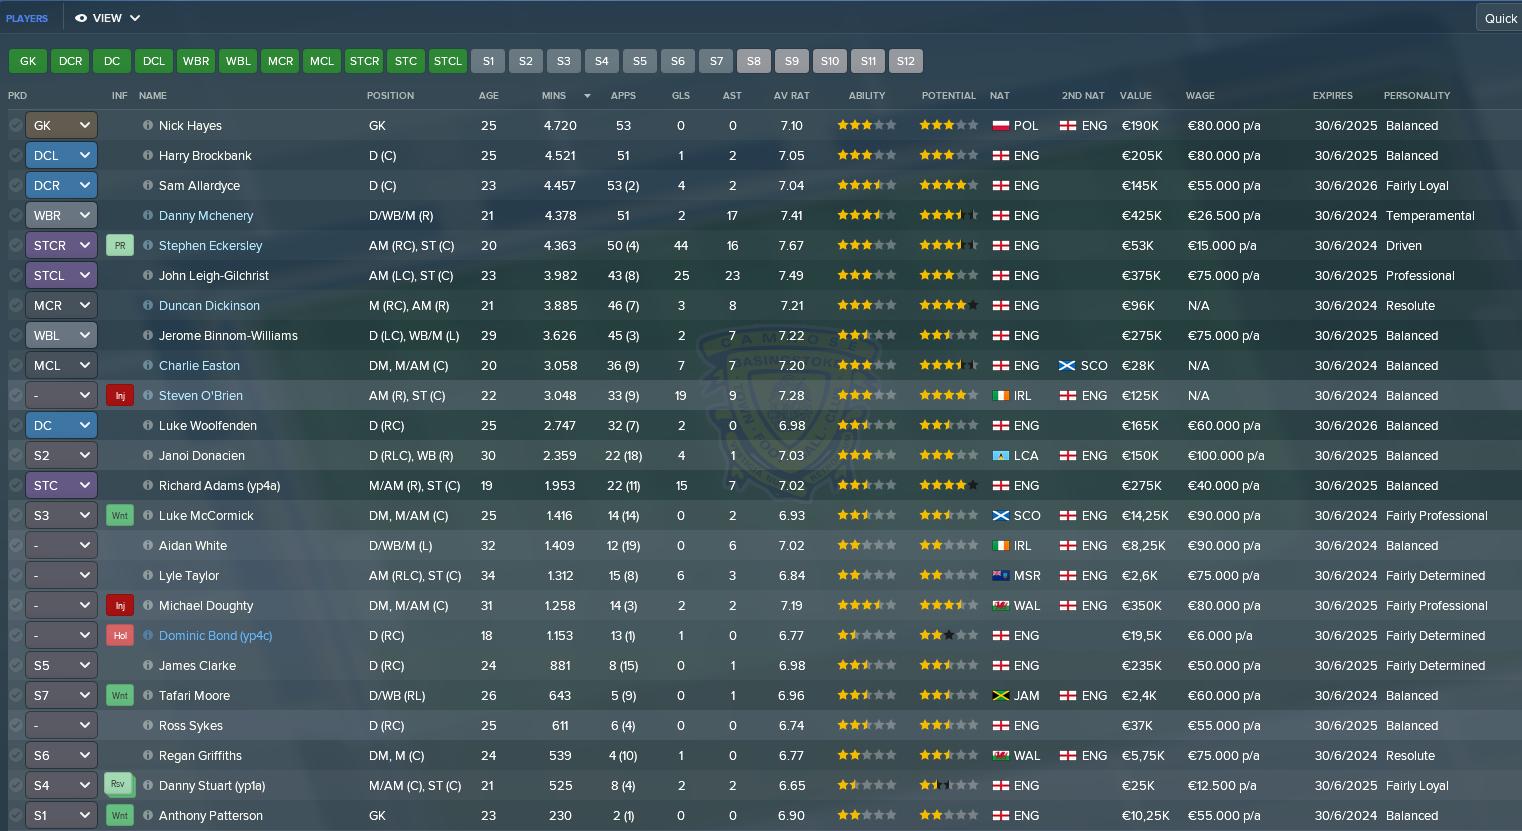 post_season_squad.png